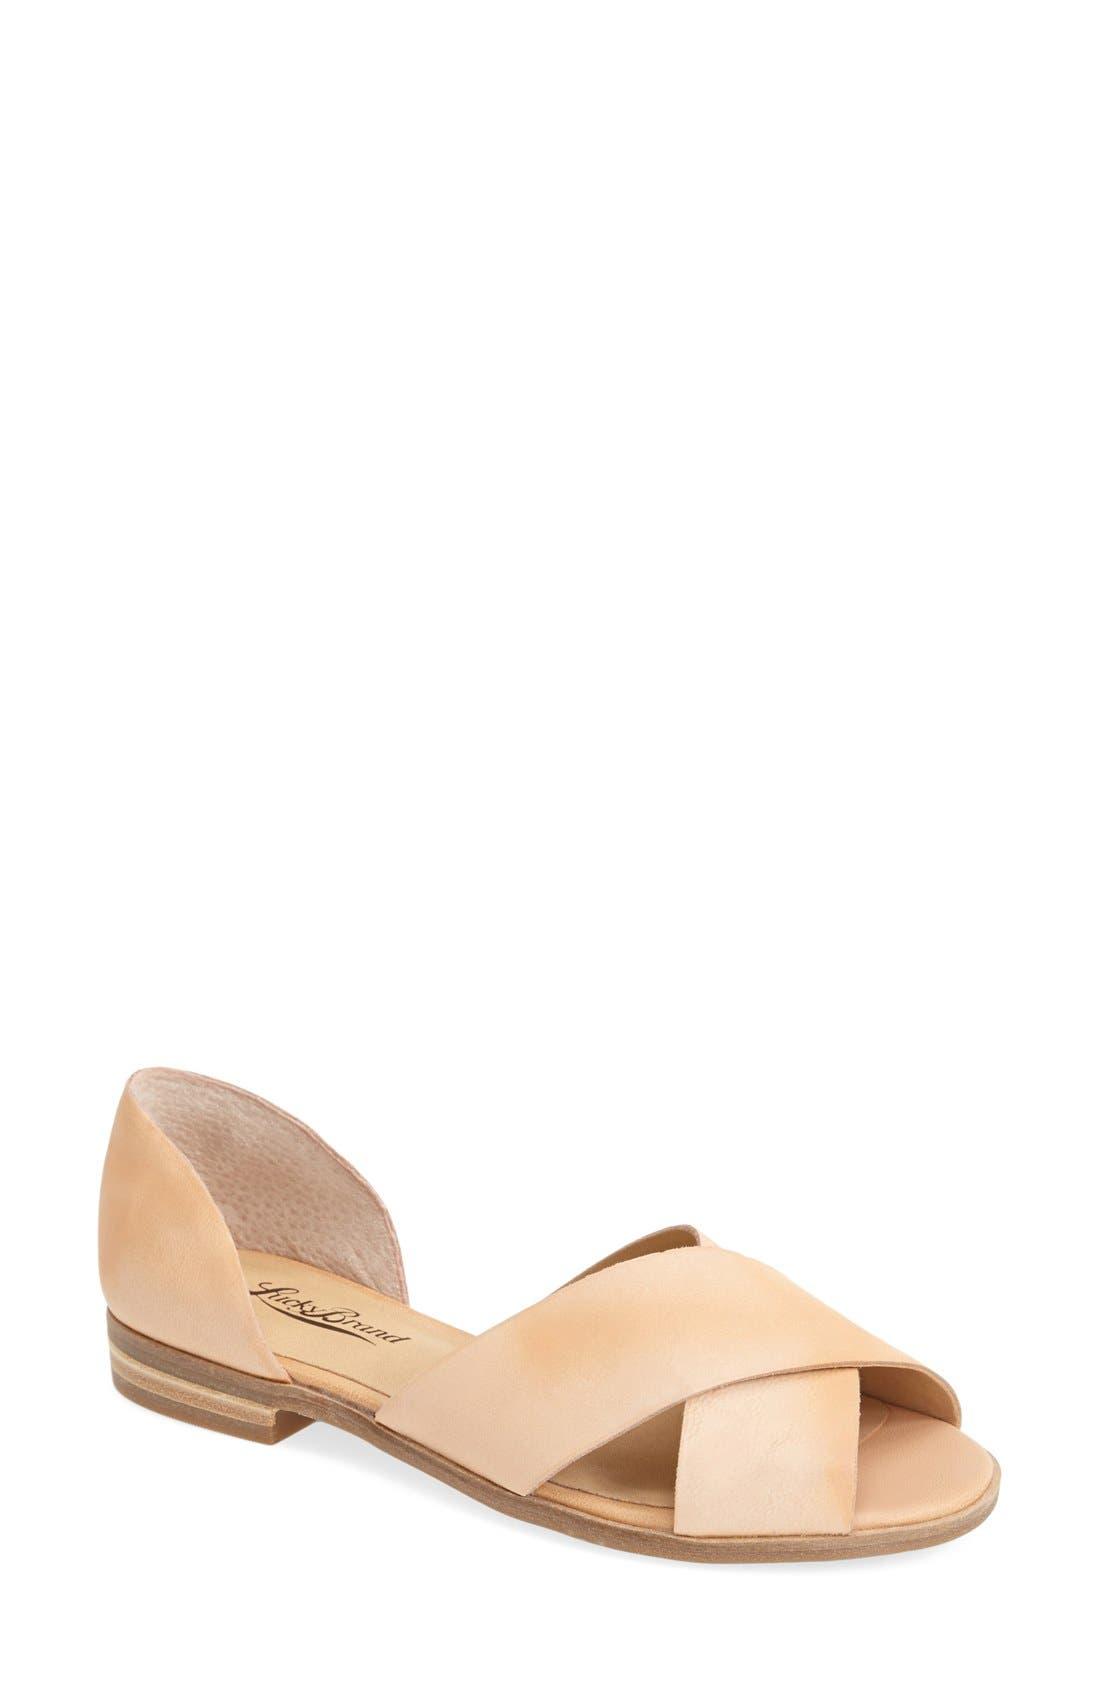 Main Image - Lucky Brand 'Silla' Leather Cross Strap Sandal (Women)